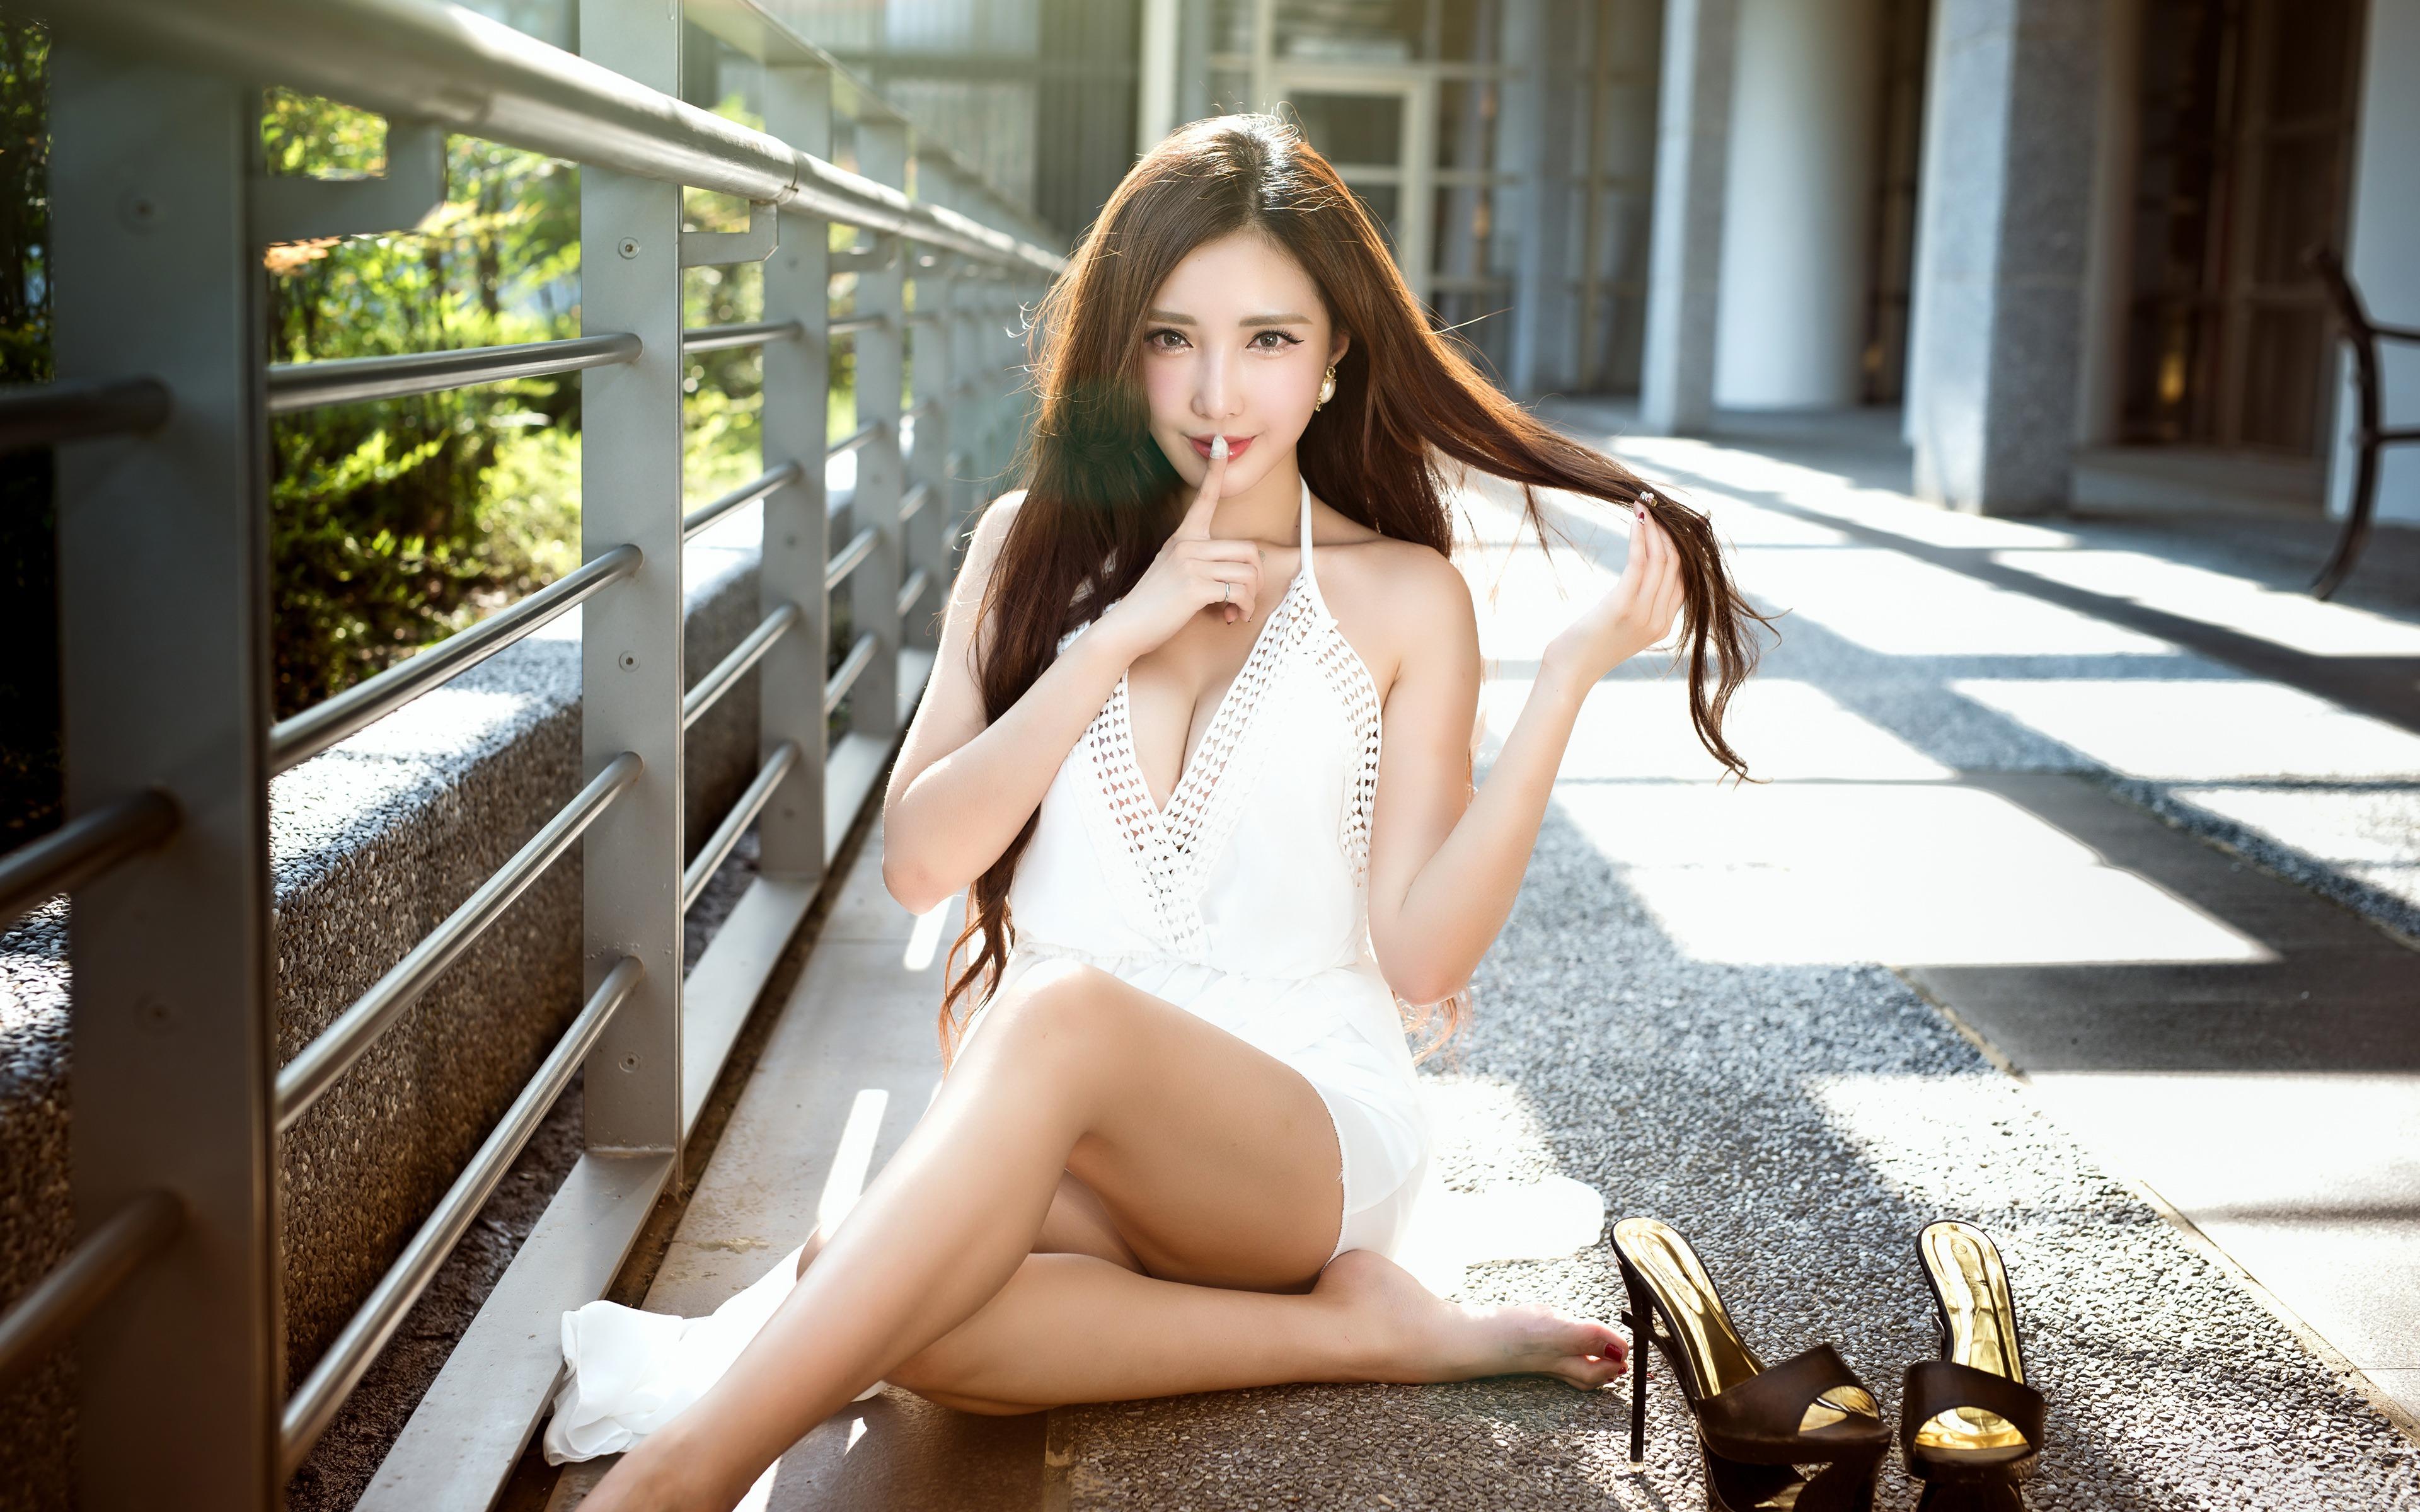 glamorous woman 4k hd desktop wallpaper for 4k ultra hd tv - HD2560×1709